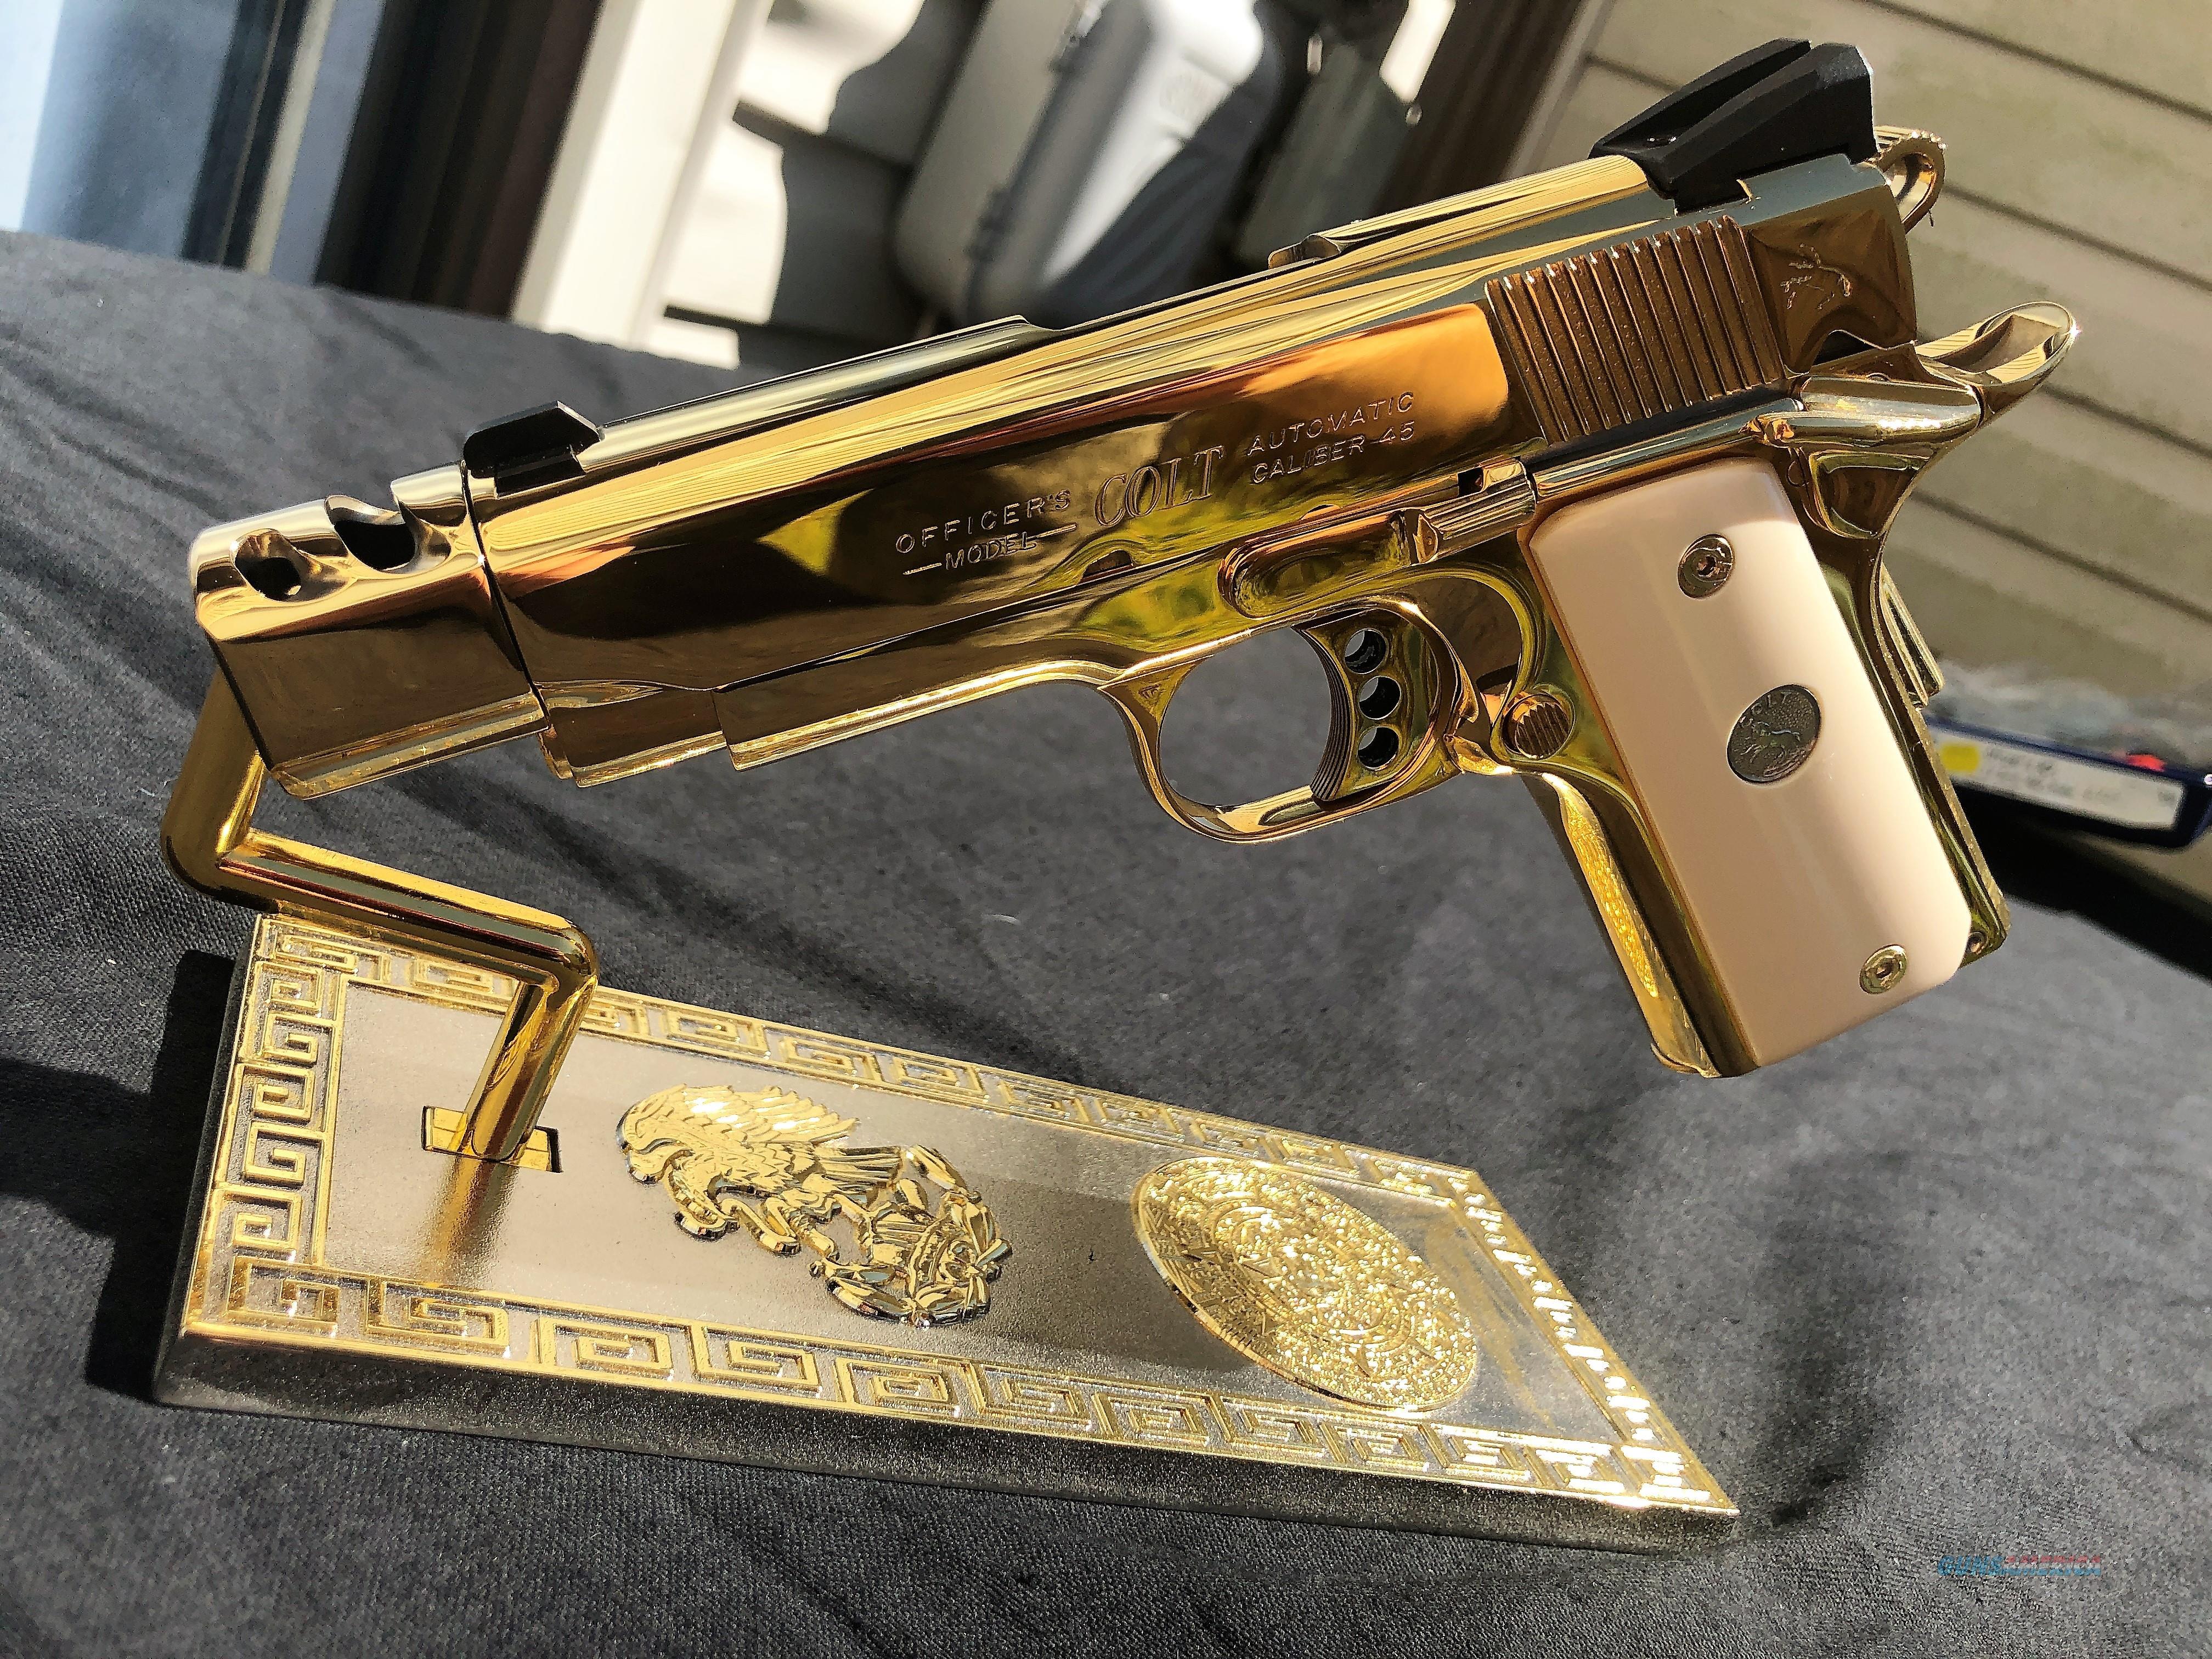 24k Gold Colt Officers MKIV custom compensator  45 1911 bonded ivory grips  UNIQUE beautiful gun FACTORY BOX